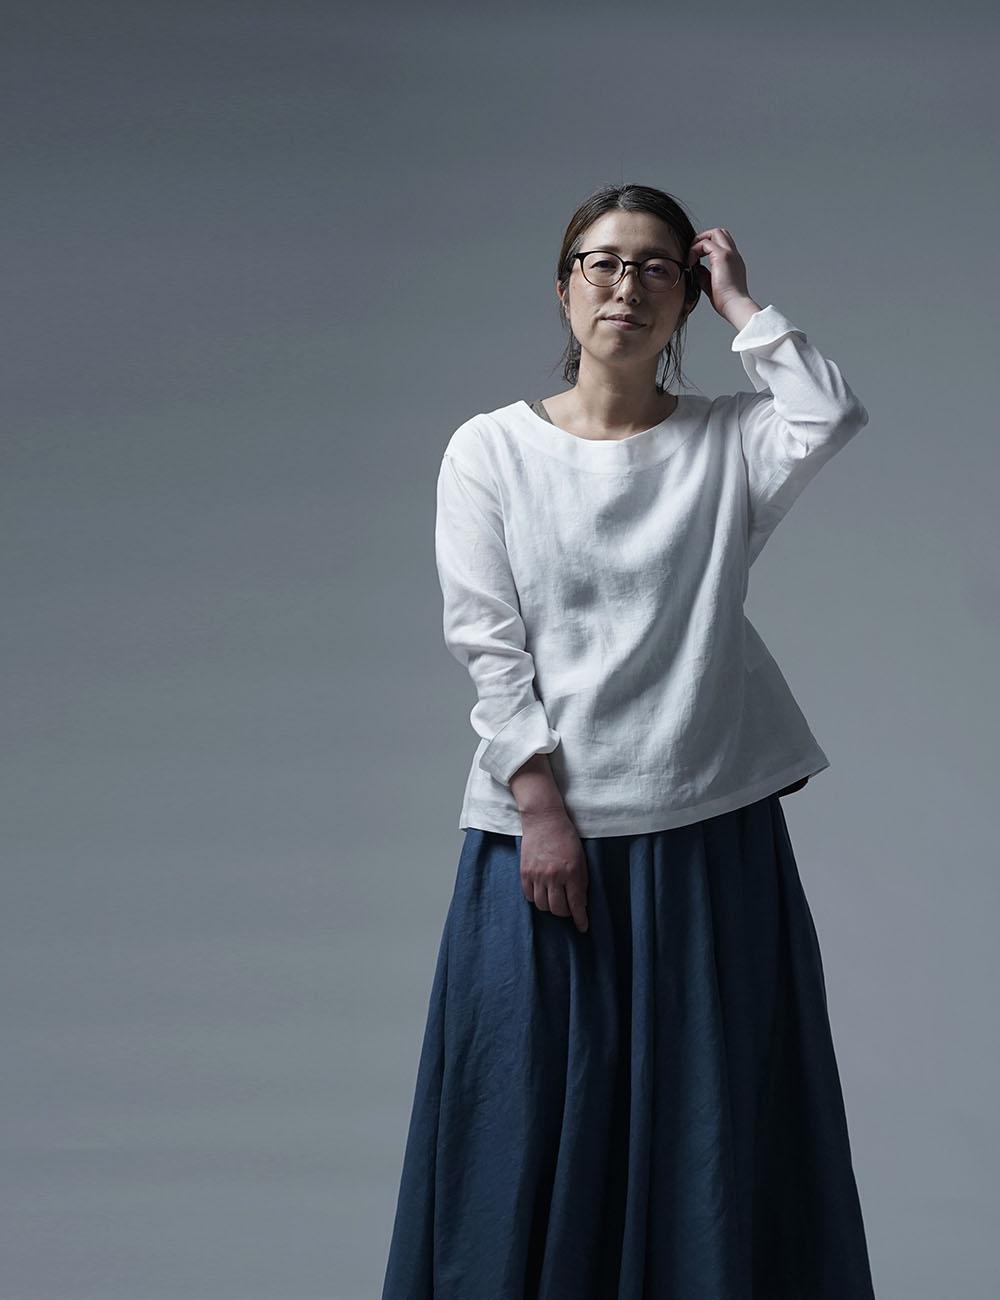 【wafu】Linen Top ブラウジング トップス / 白色 t025h-wht1